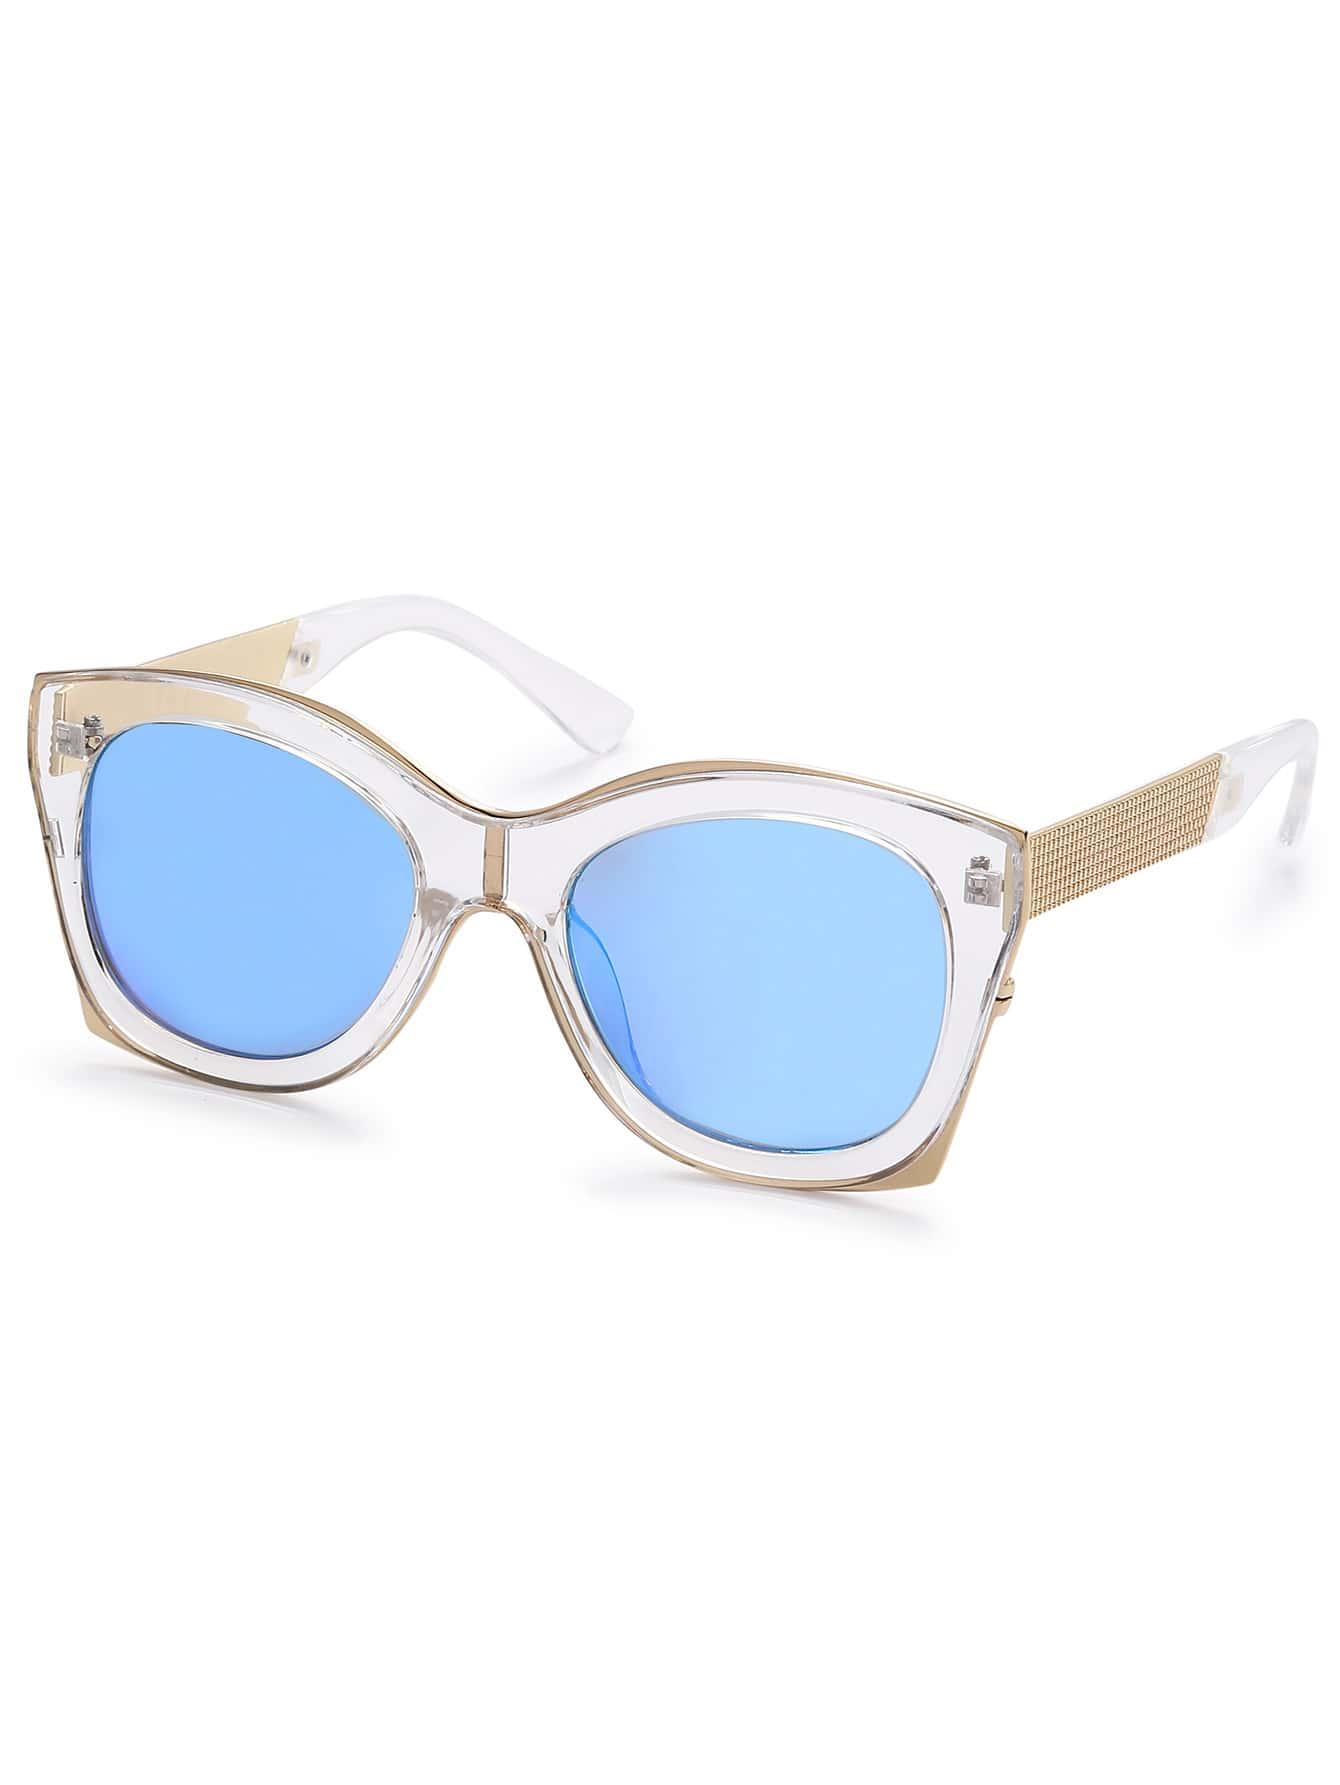 Clear Frame Blue Lens Sunglasses sunglass160811304